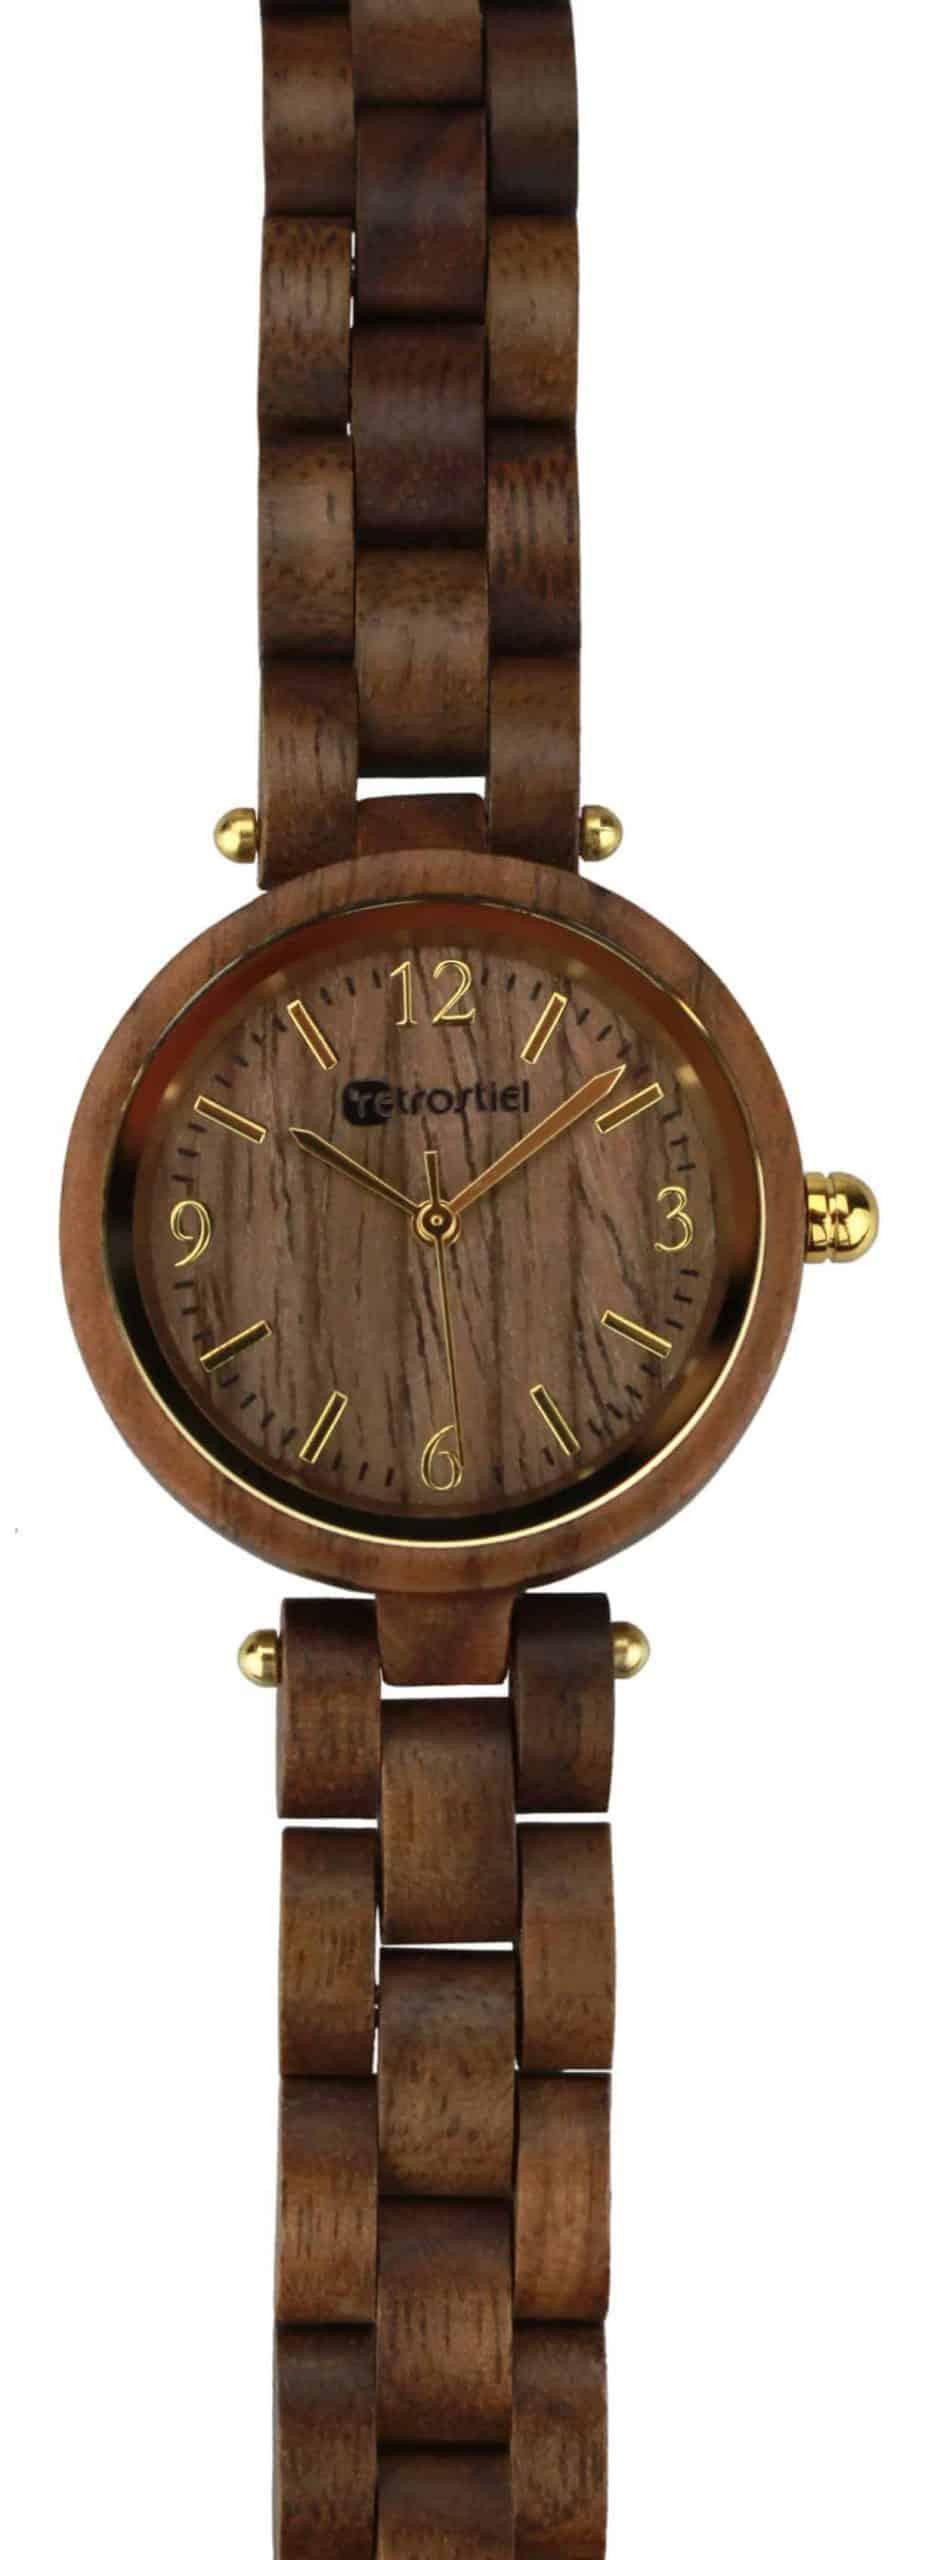 Wooden watch - Venezia Nut